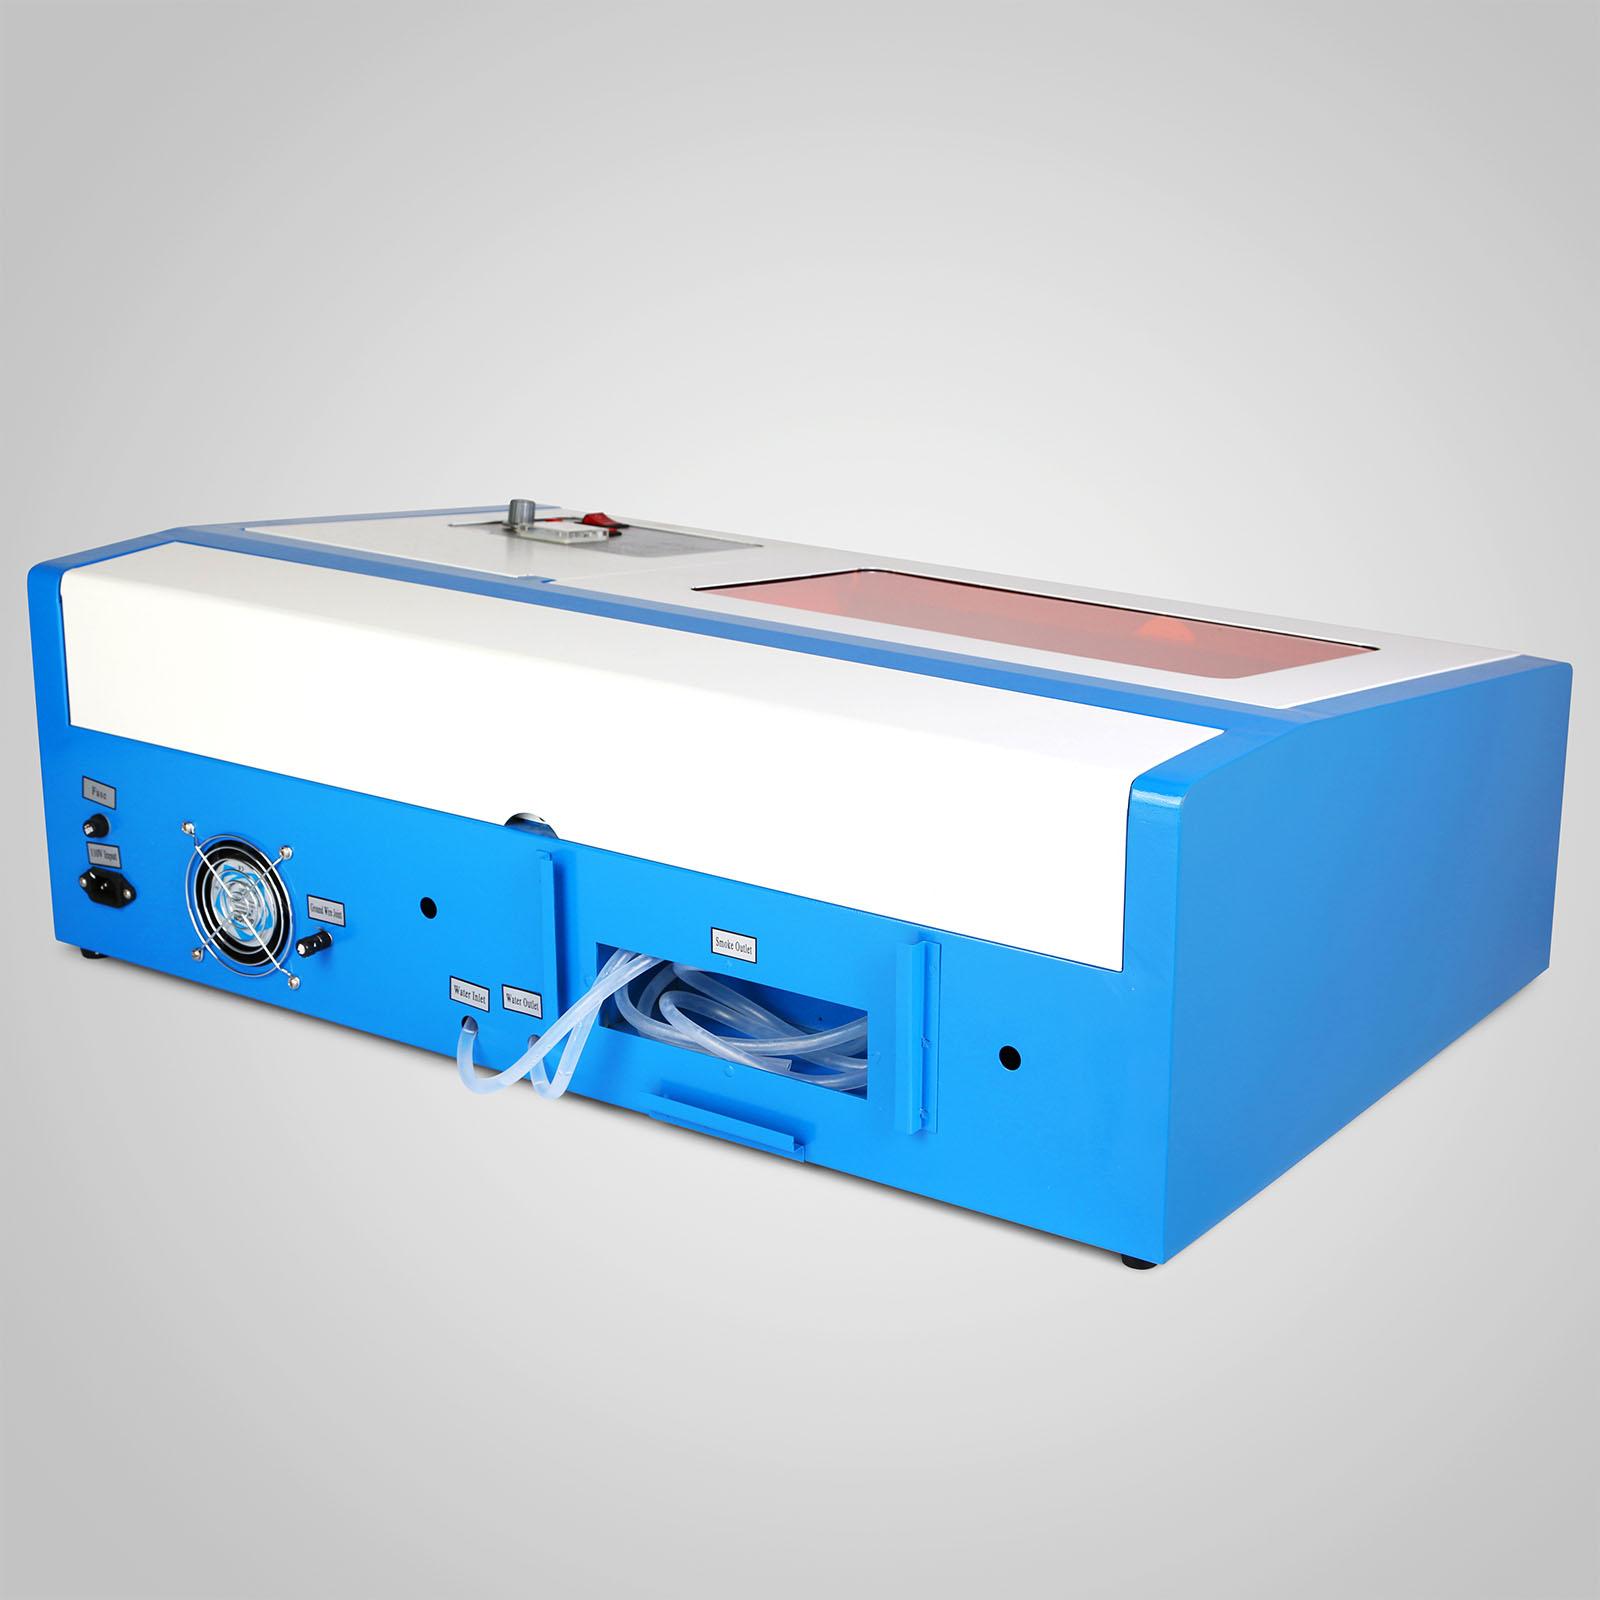 Macchina-per-Incisione-Laser-CO2-40-130W-Asse-Rotante-Tagliatrice-Incisore miniatura 18